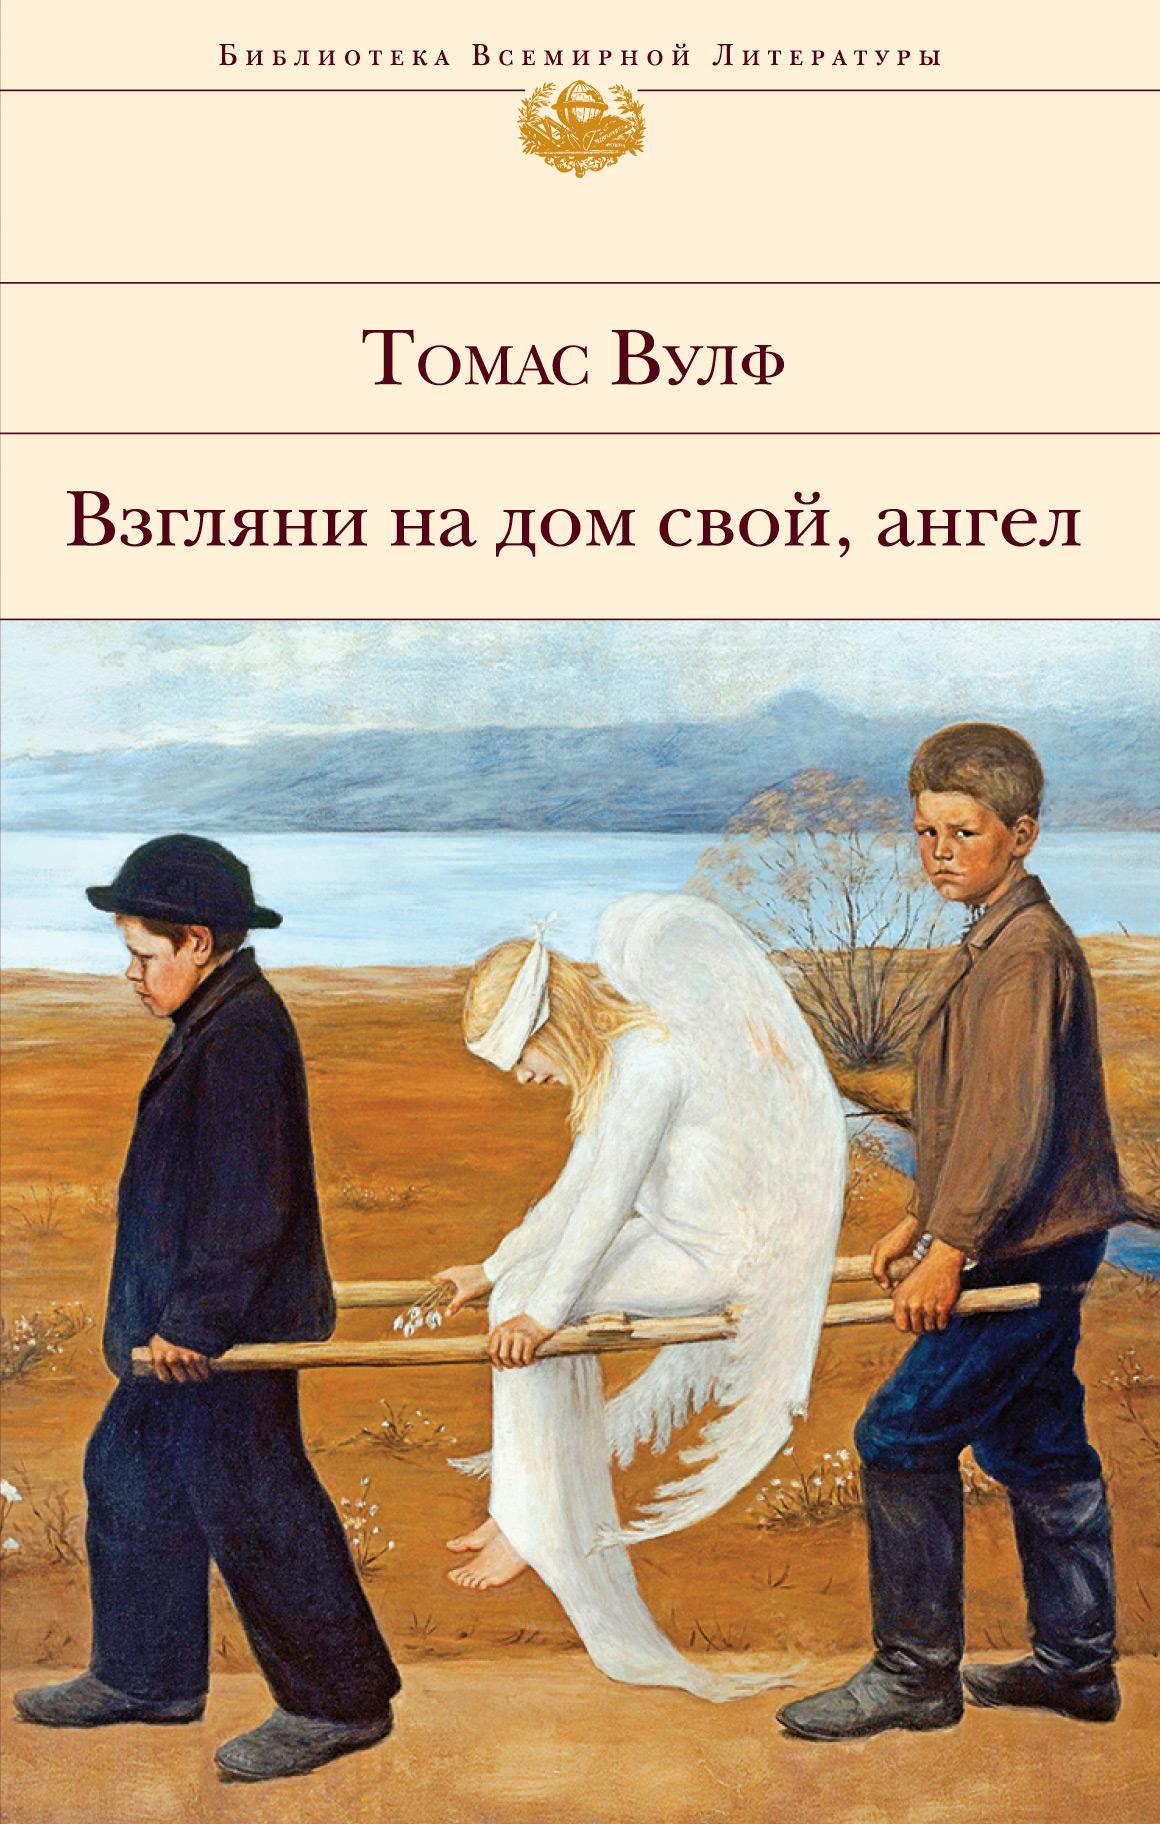 Томас Вулф Взгляни на дом свой, ангел томас вулф паутина земли